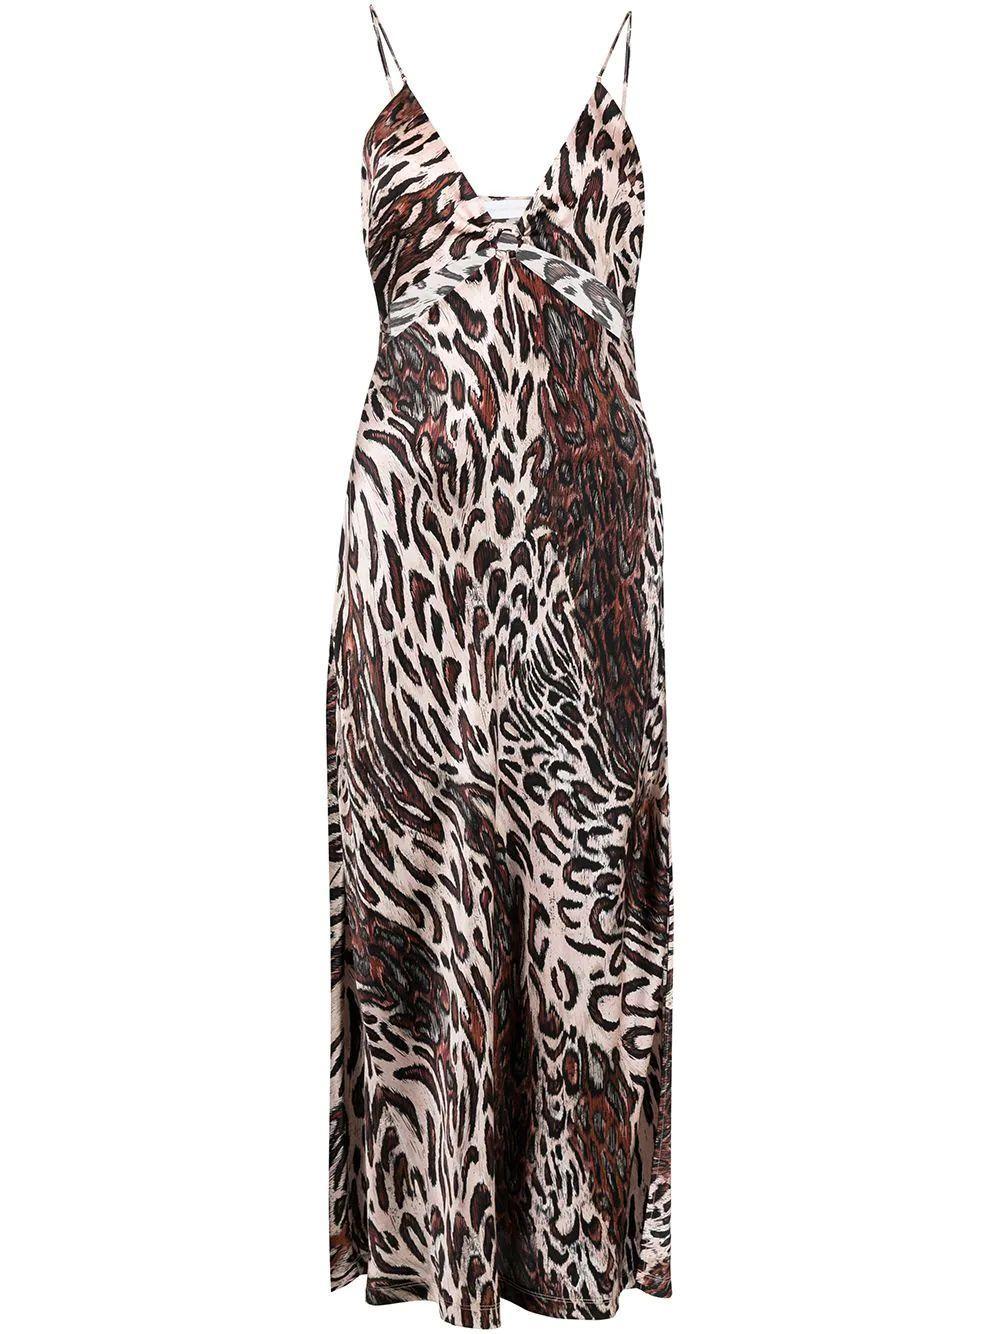 Champagne Abstract Leopard Print Dress Item # 621-1022-ST-PRINT